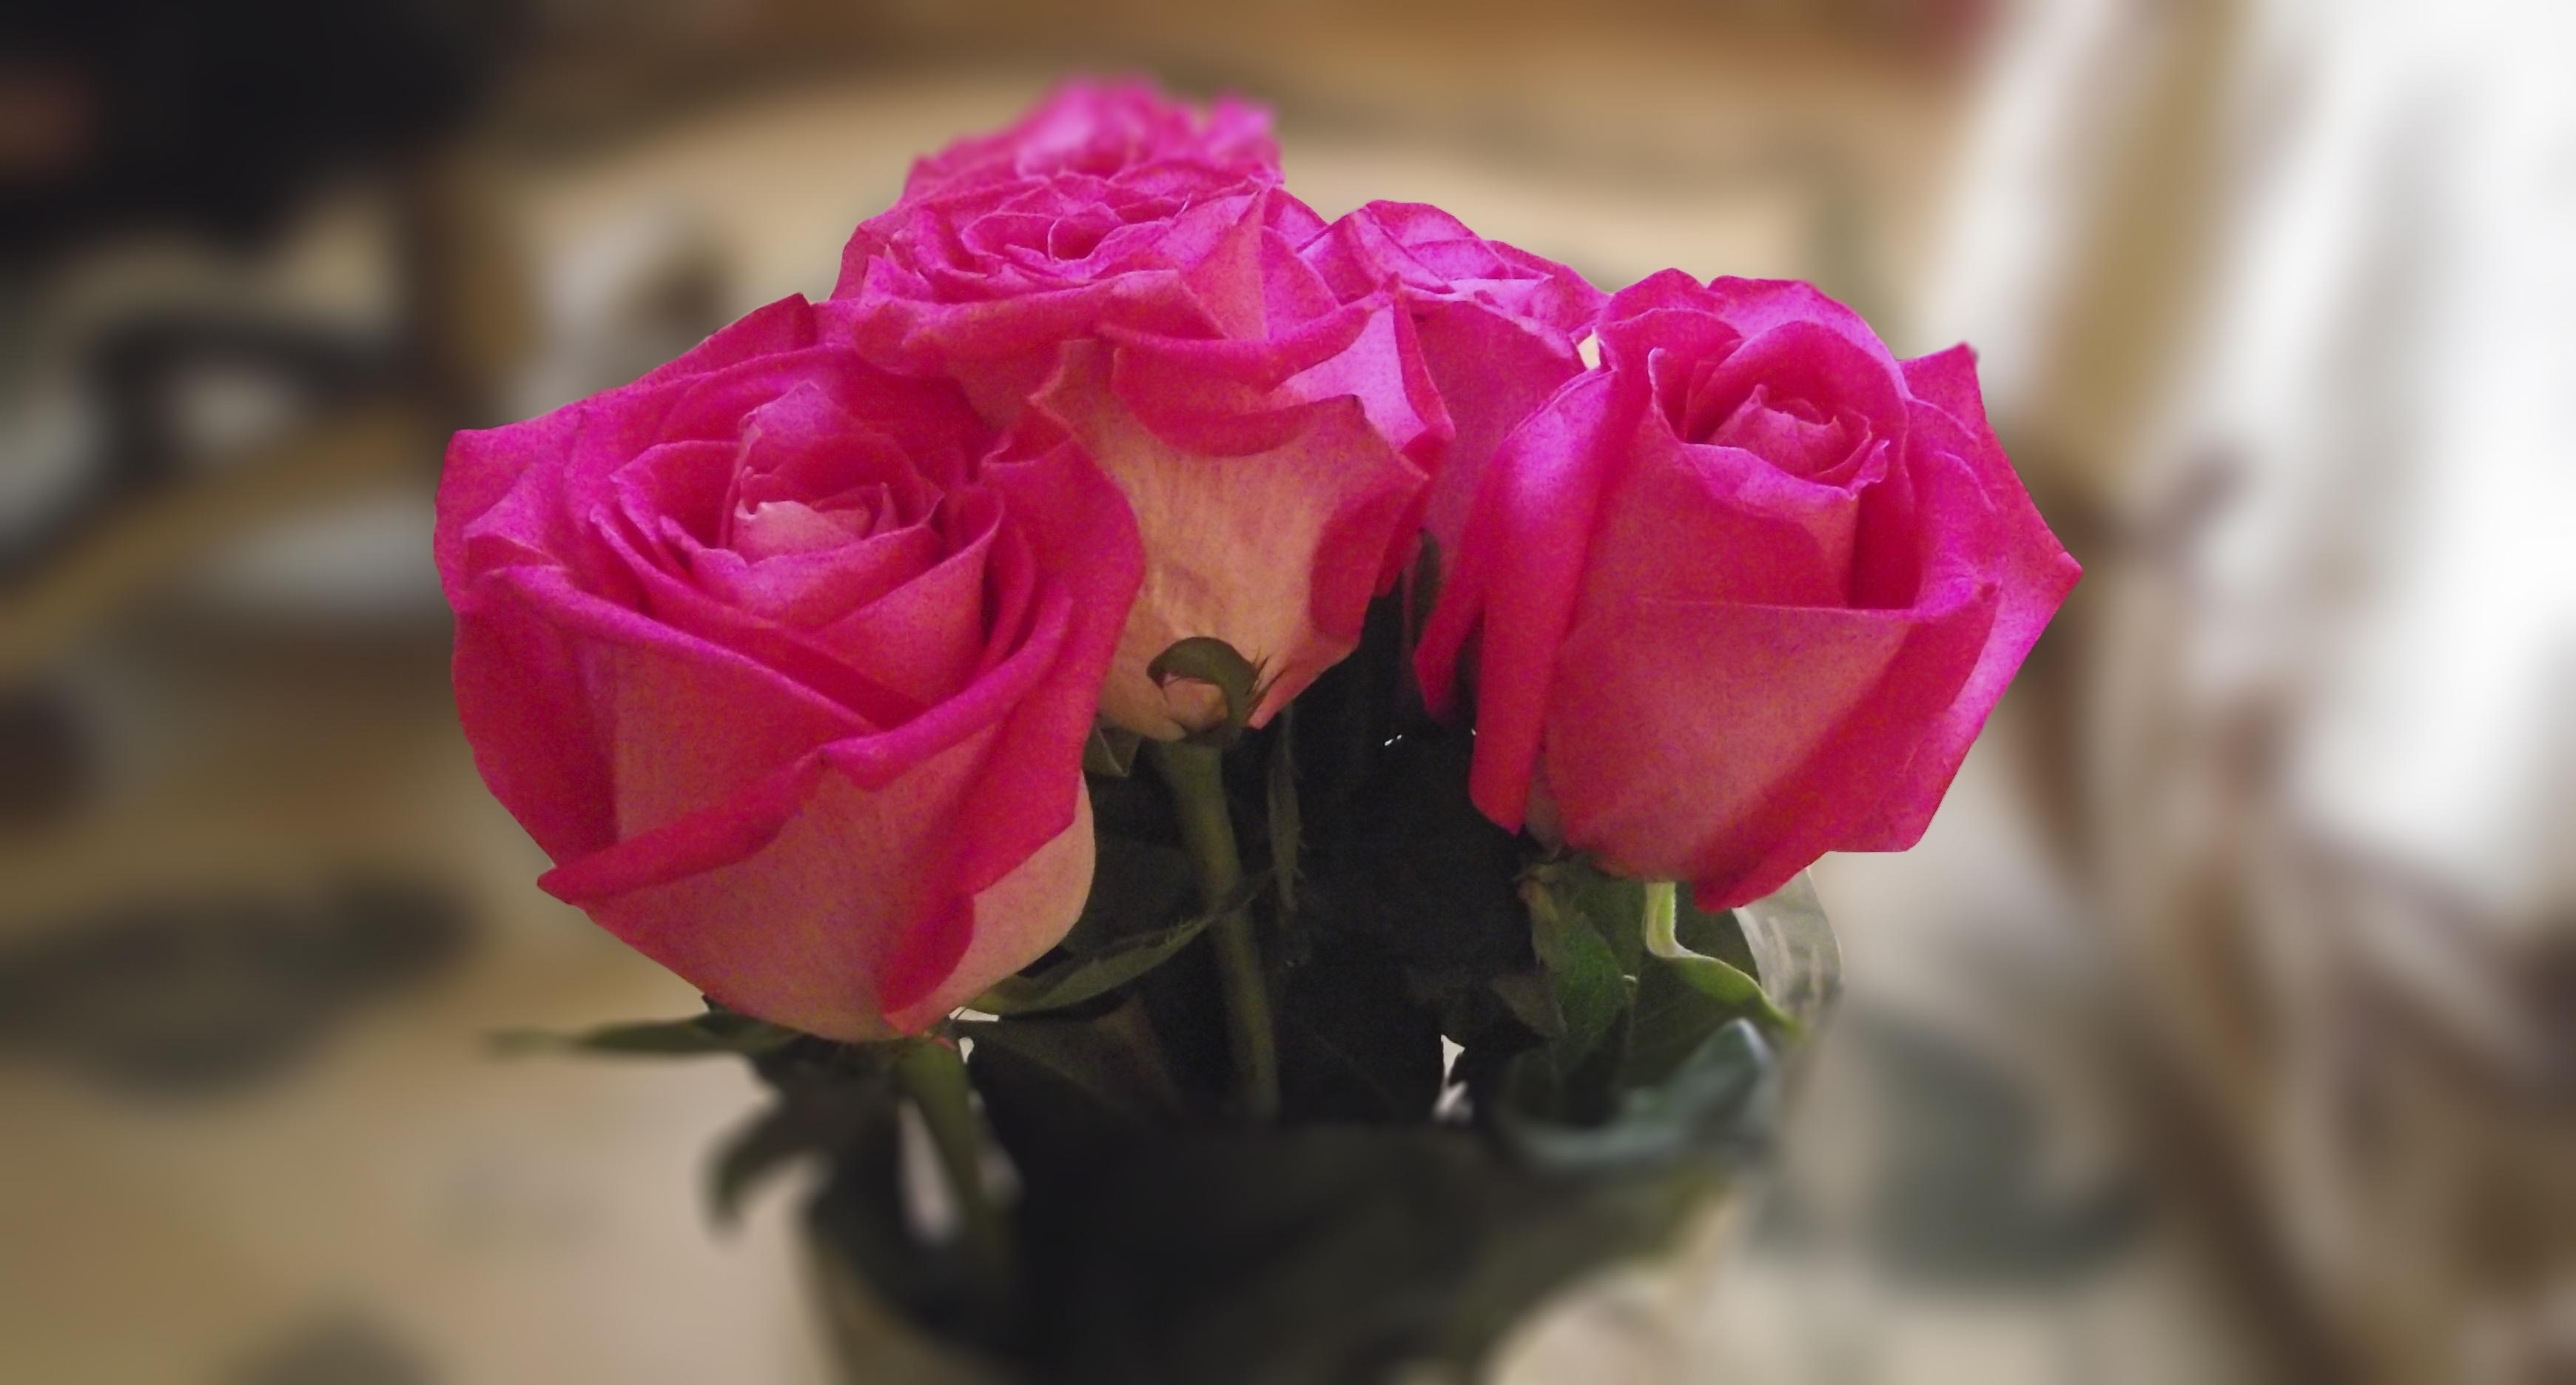 free images : blossom, flower, petal, bouquet, flora, red rose